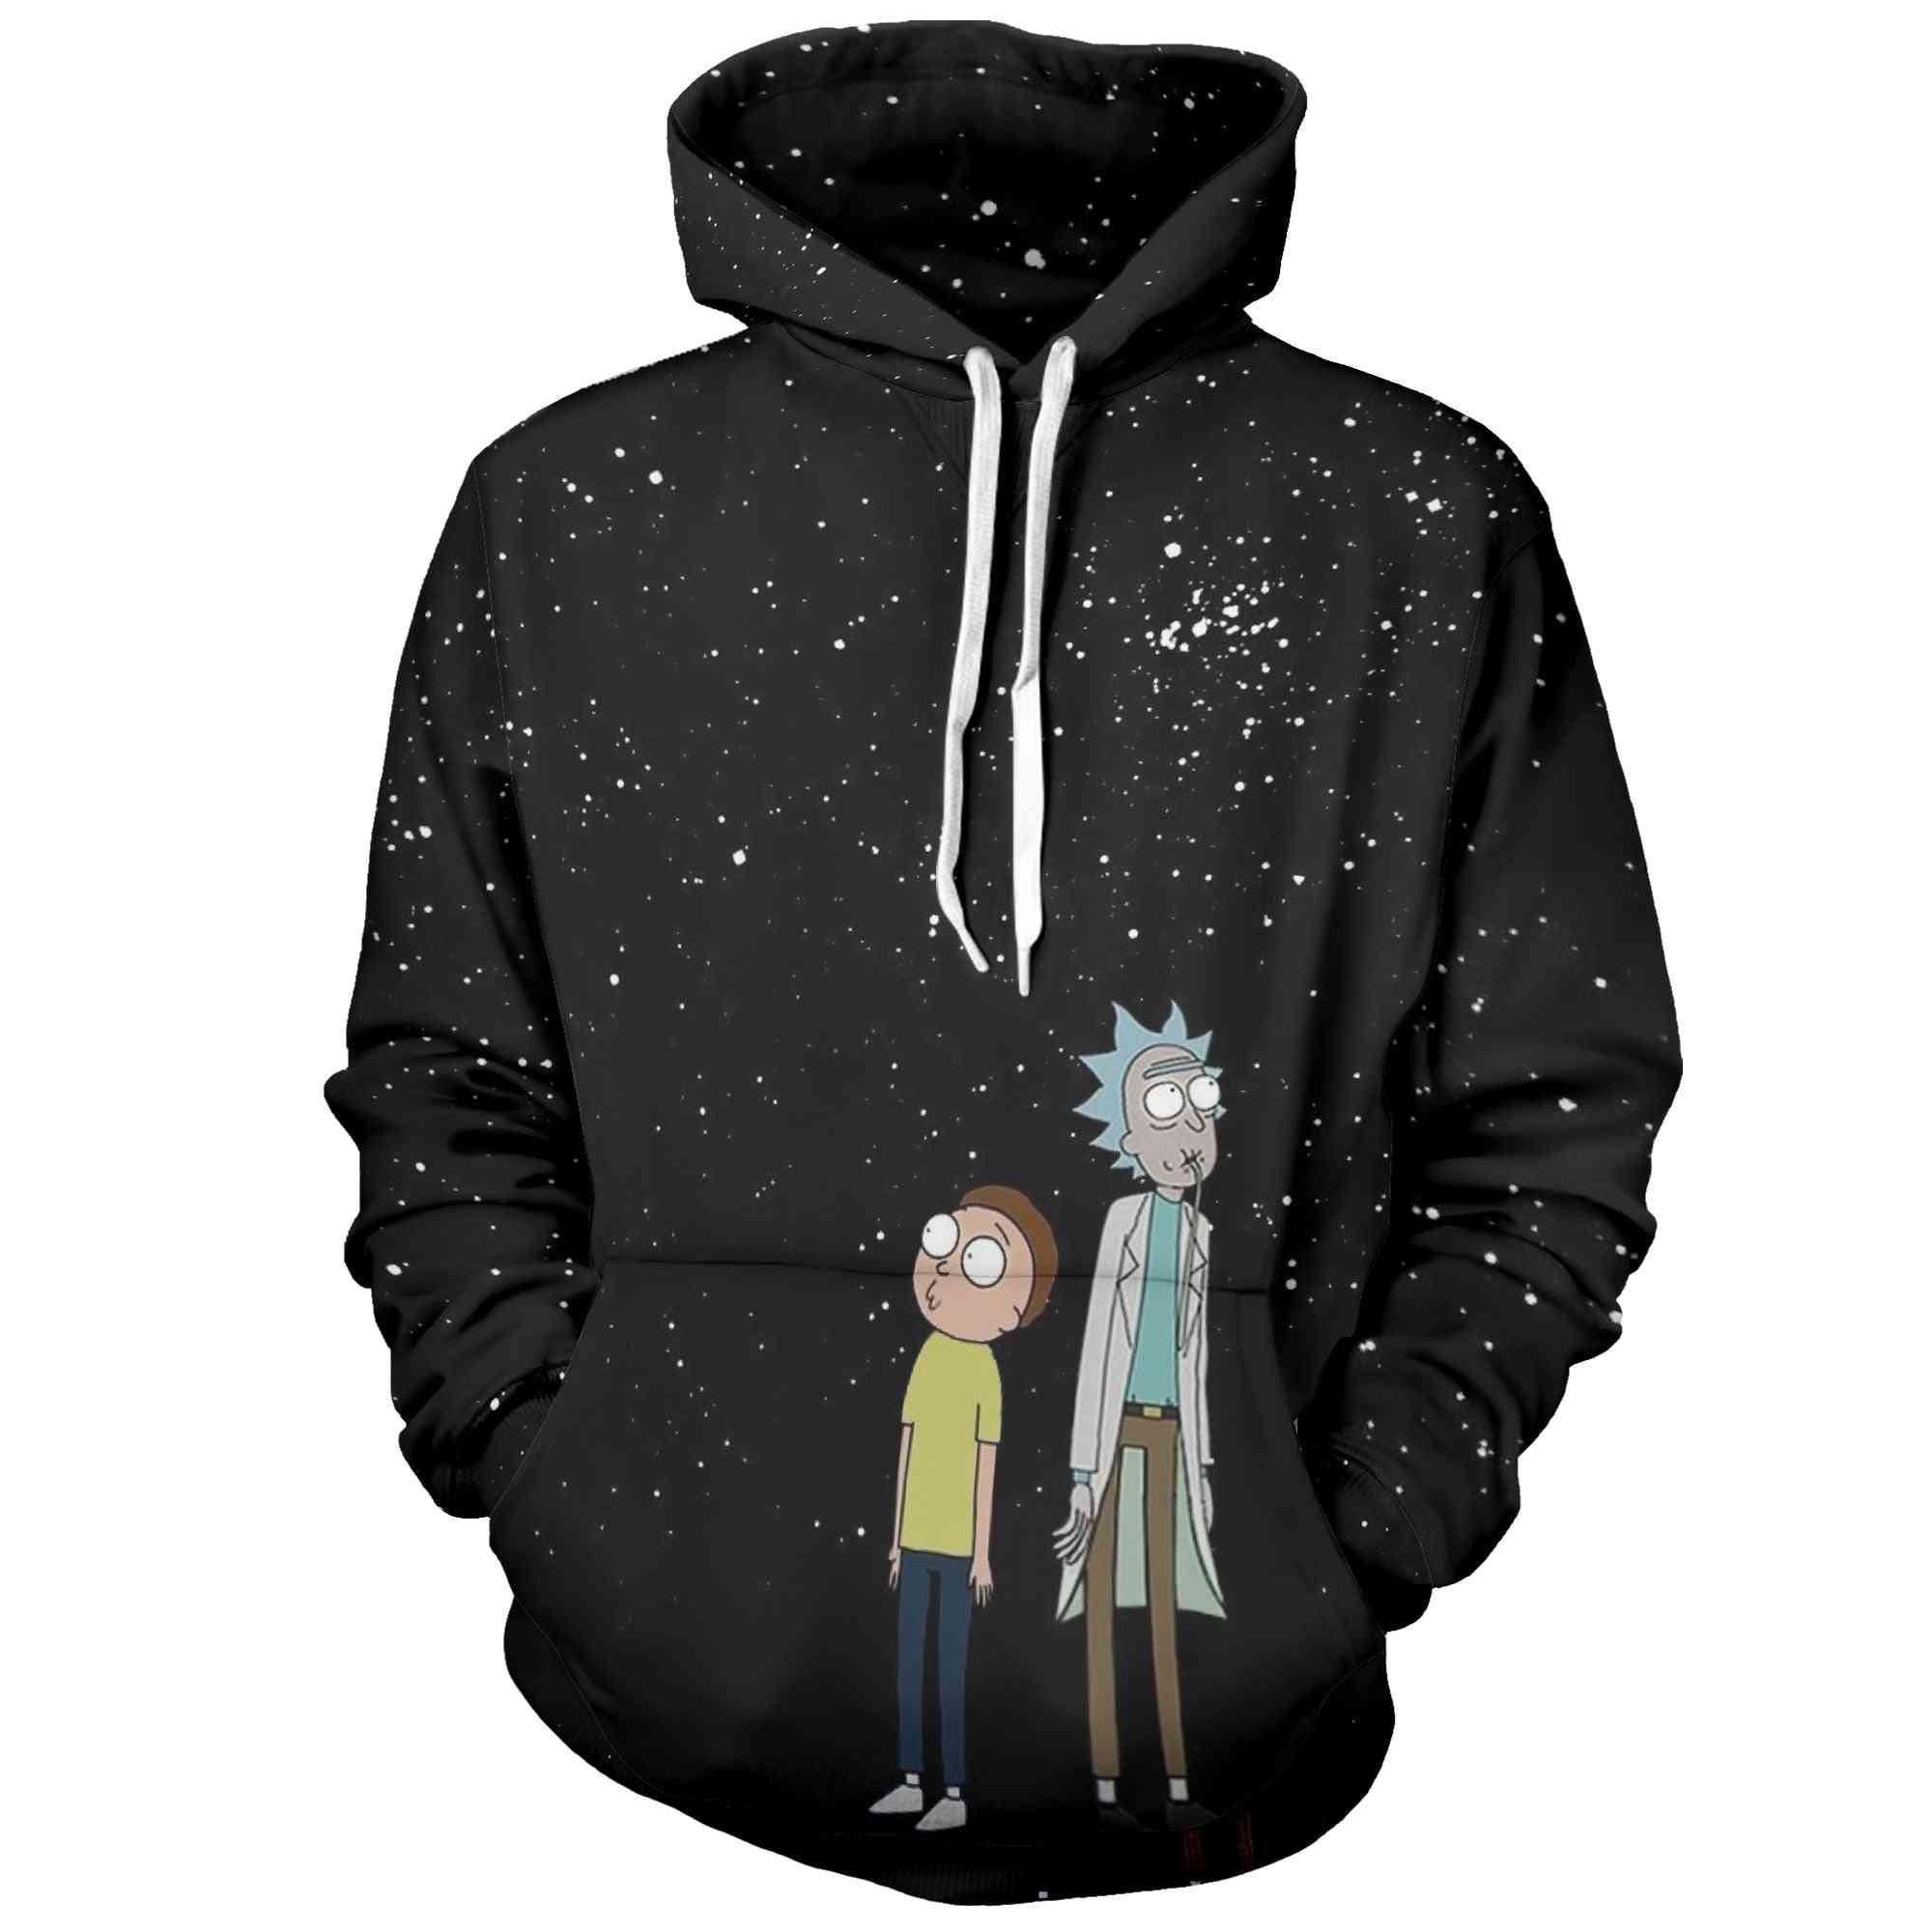 3d Hoodies- Creative Harajuku Galaxy Printing Casual Hoodie Sweatshirt